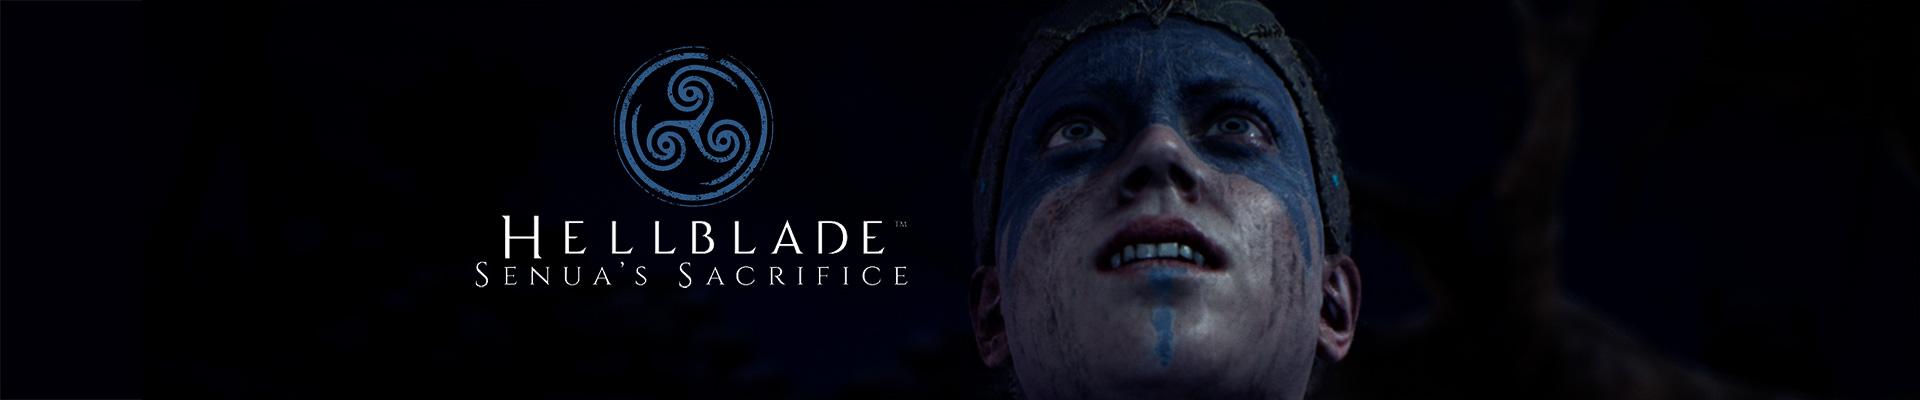 Мысли про: Hellblade: Senua's Sacrifice